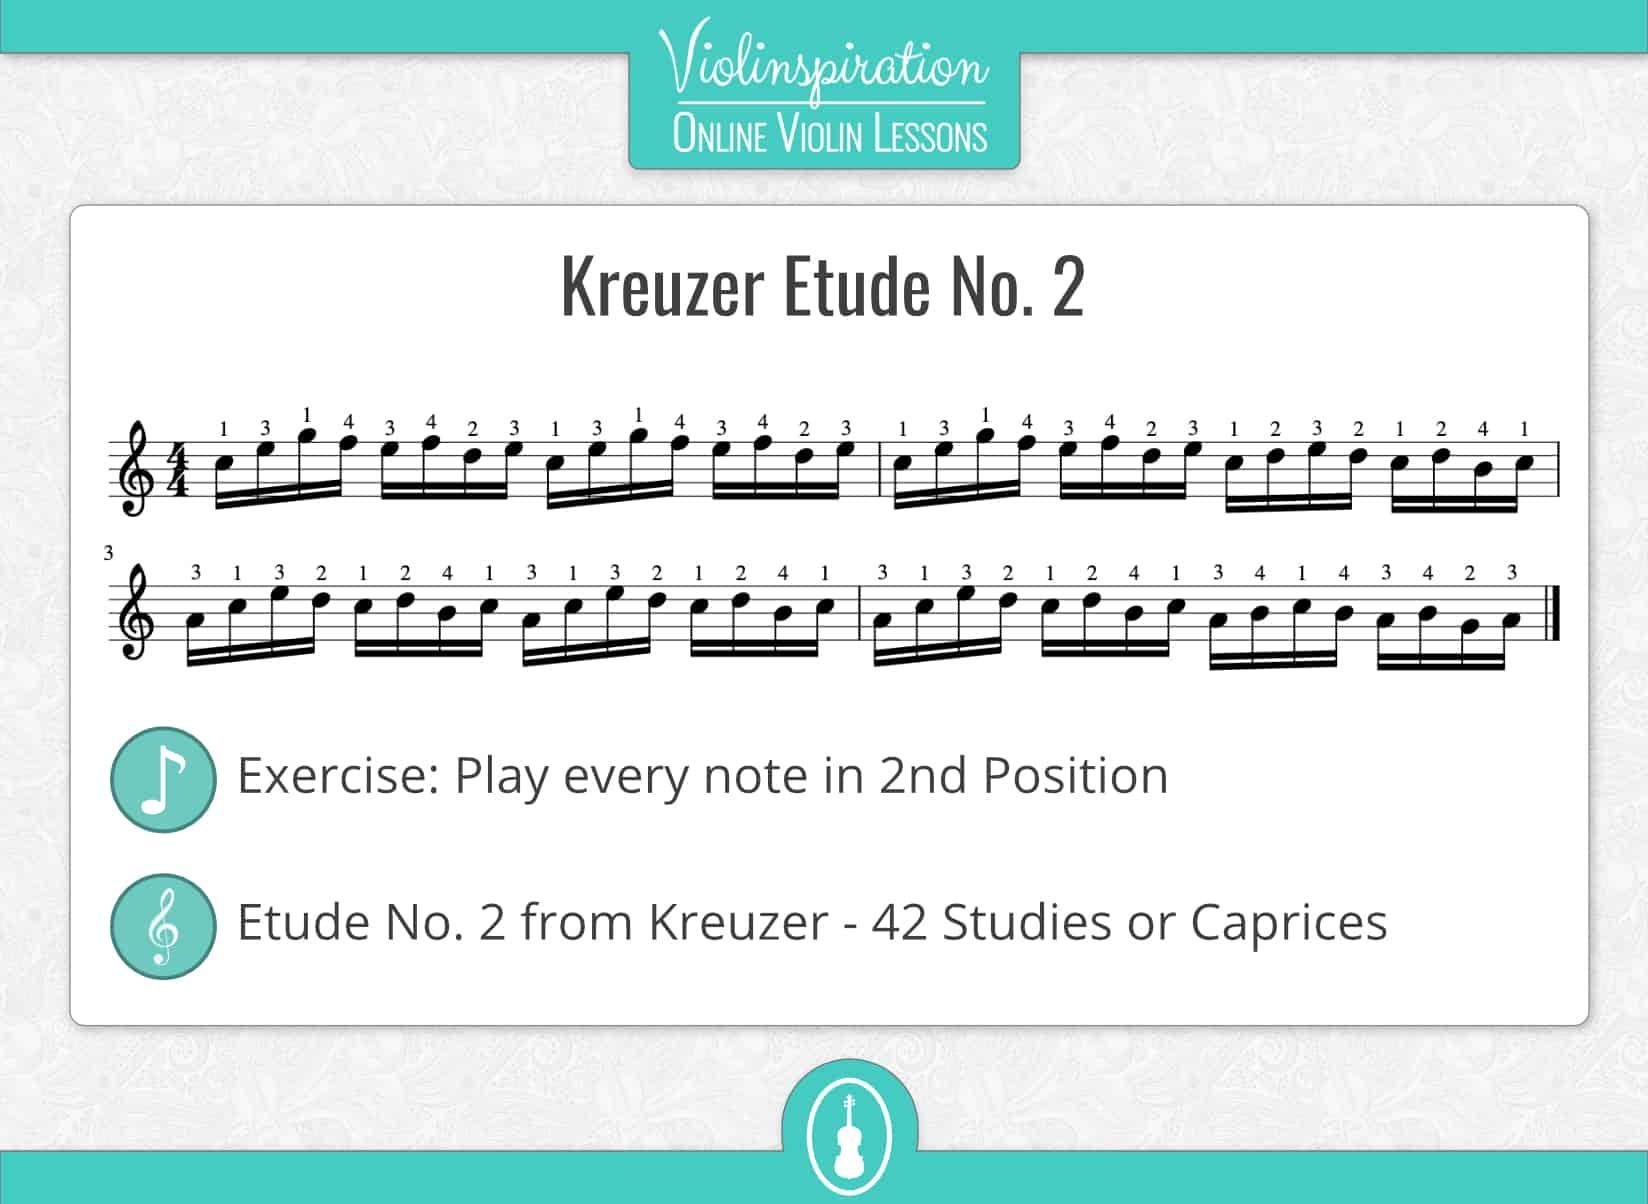 Violin Positions - Kreuzer Etude No.2 Second Position